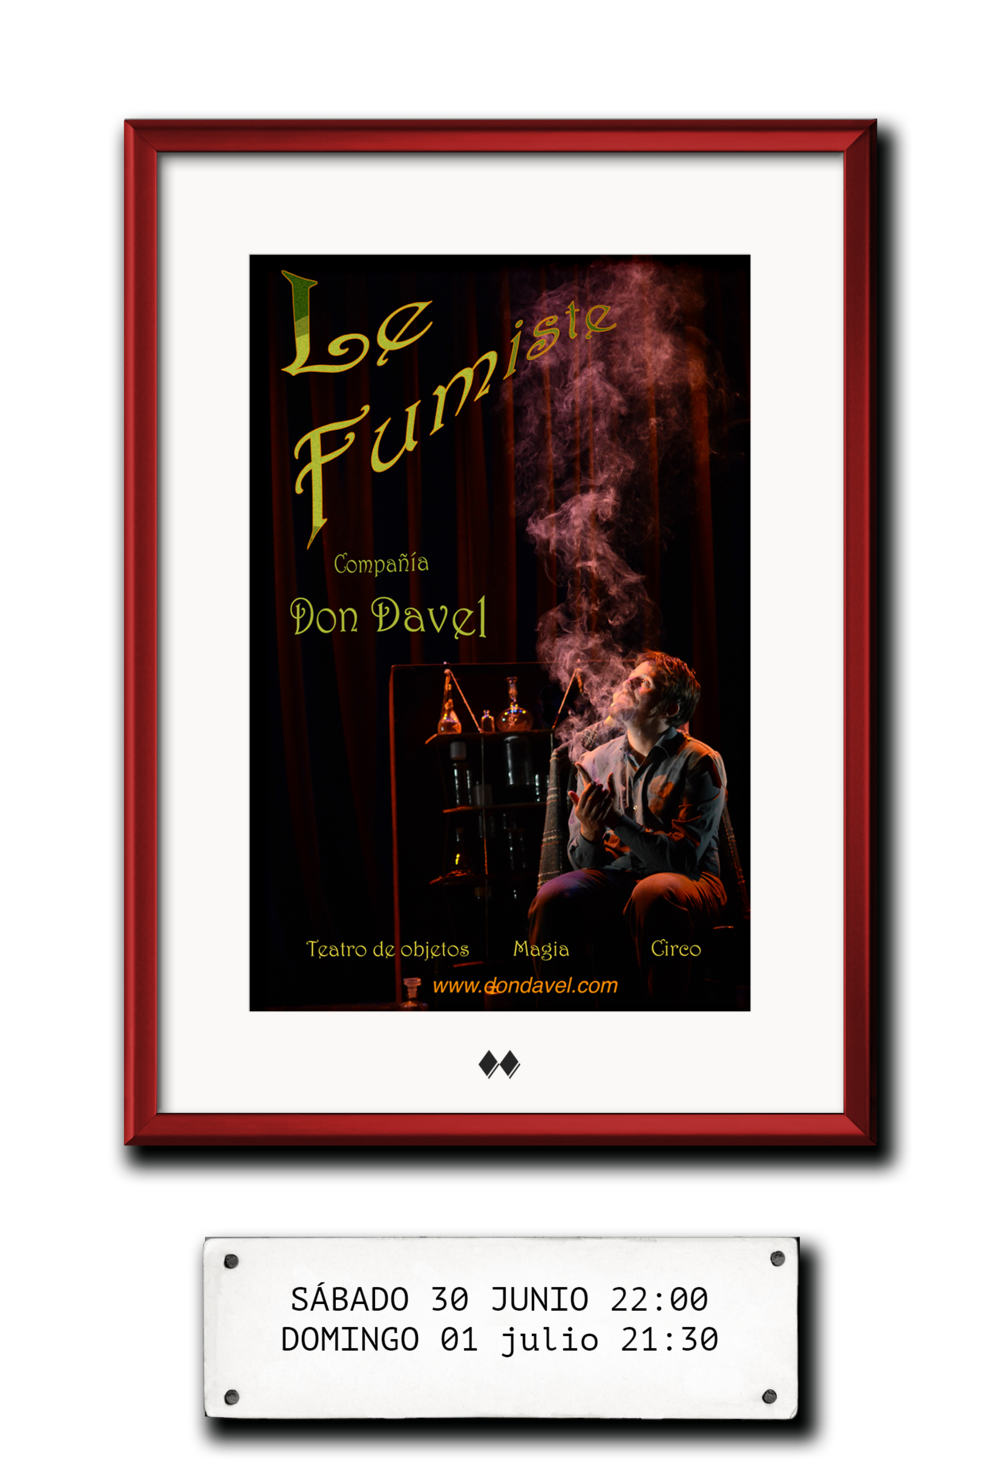 cuadro-fumiste-circo-magia-malabares-madrid-teatro-arlequin-gran-via-comprar-entradas.png